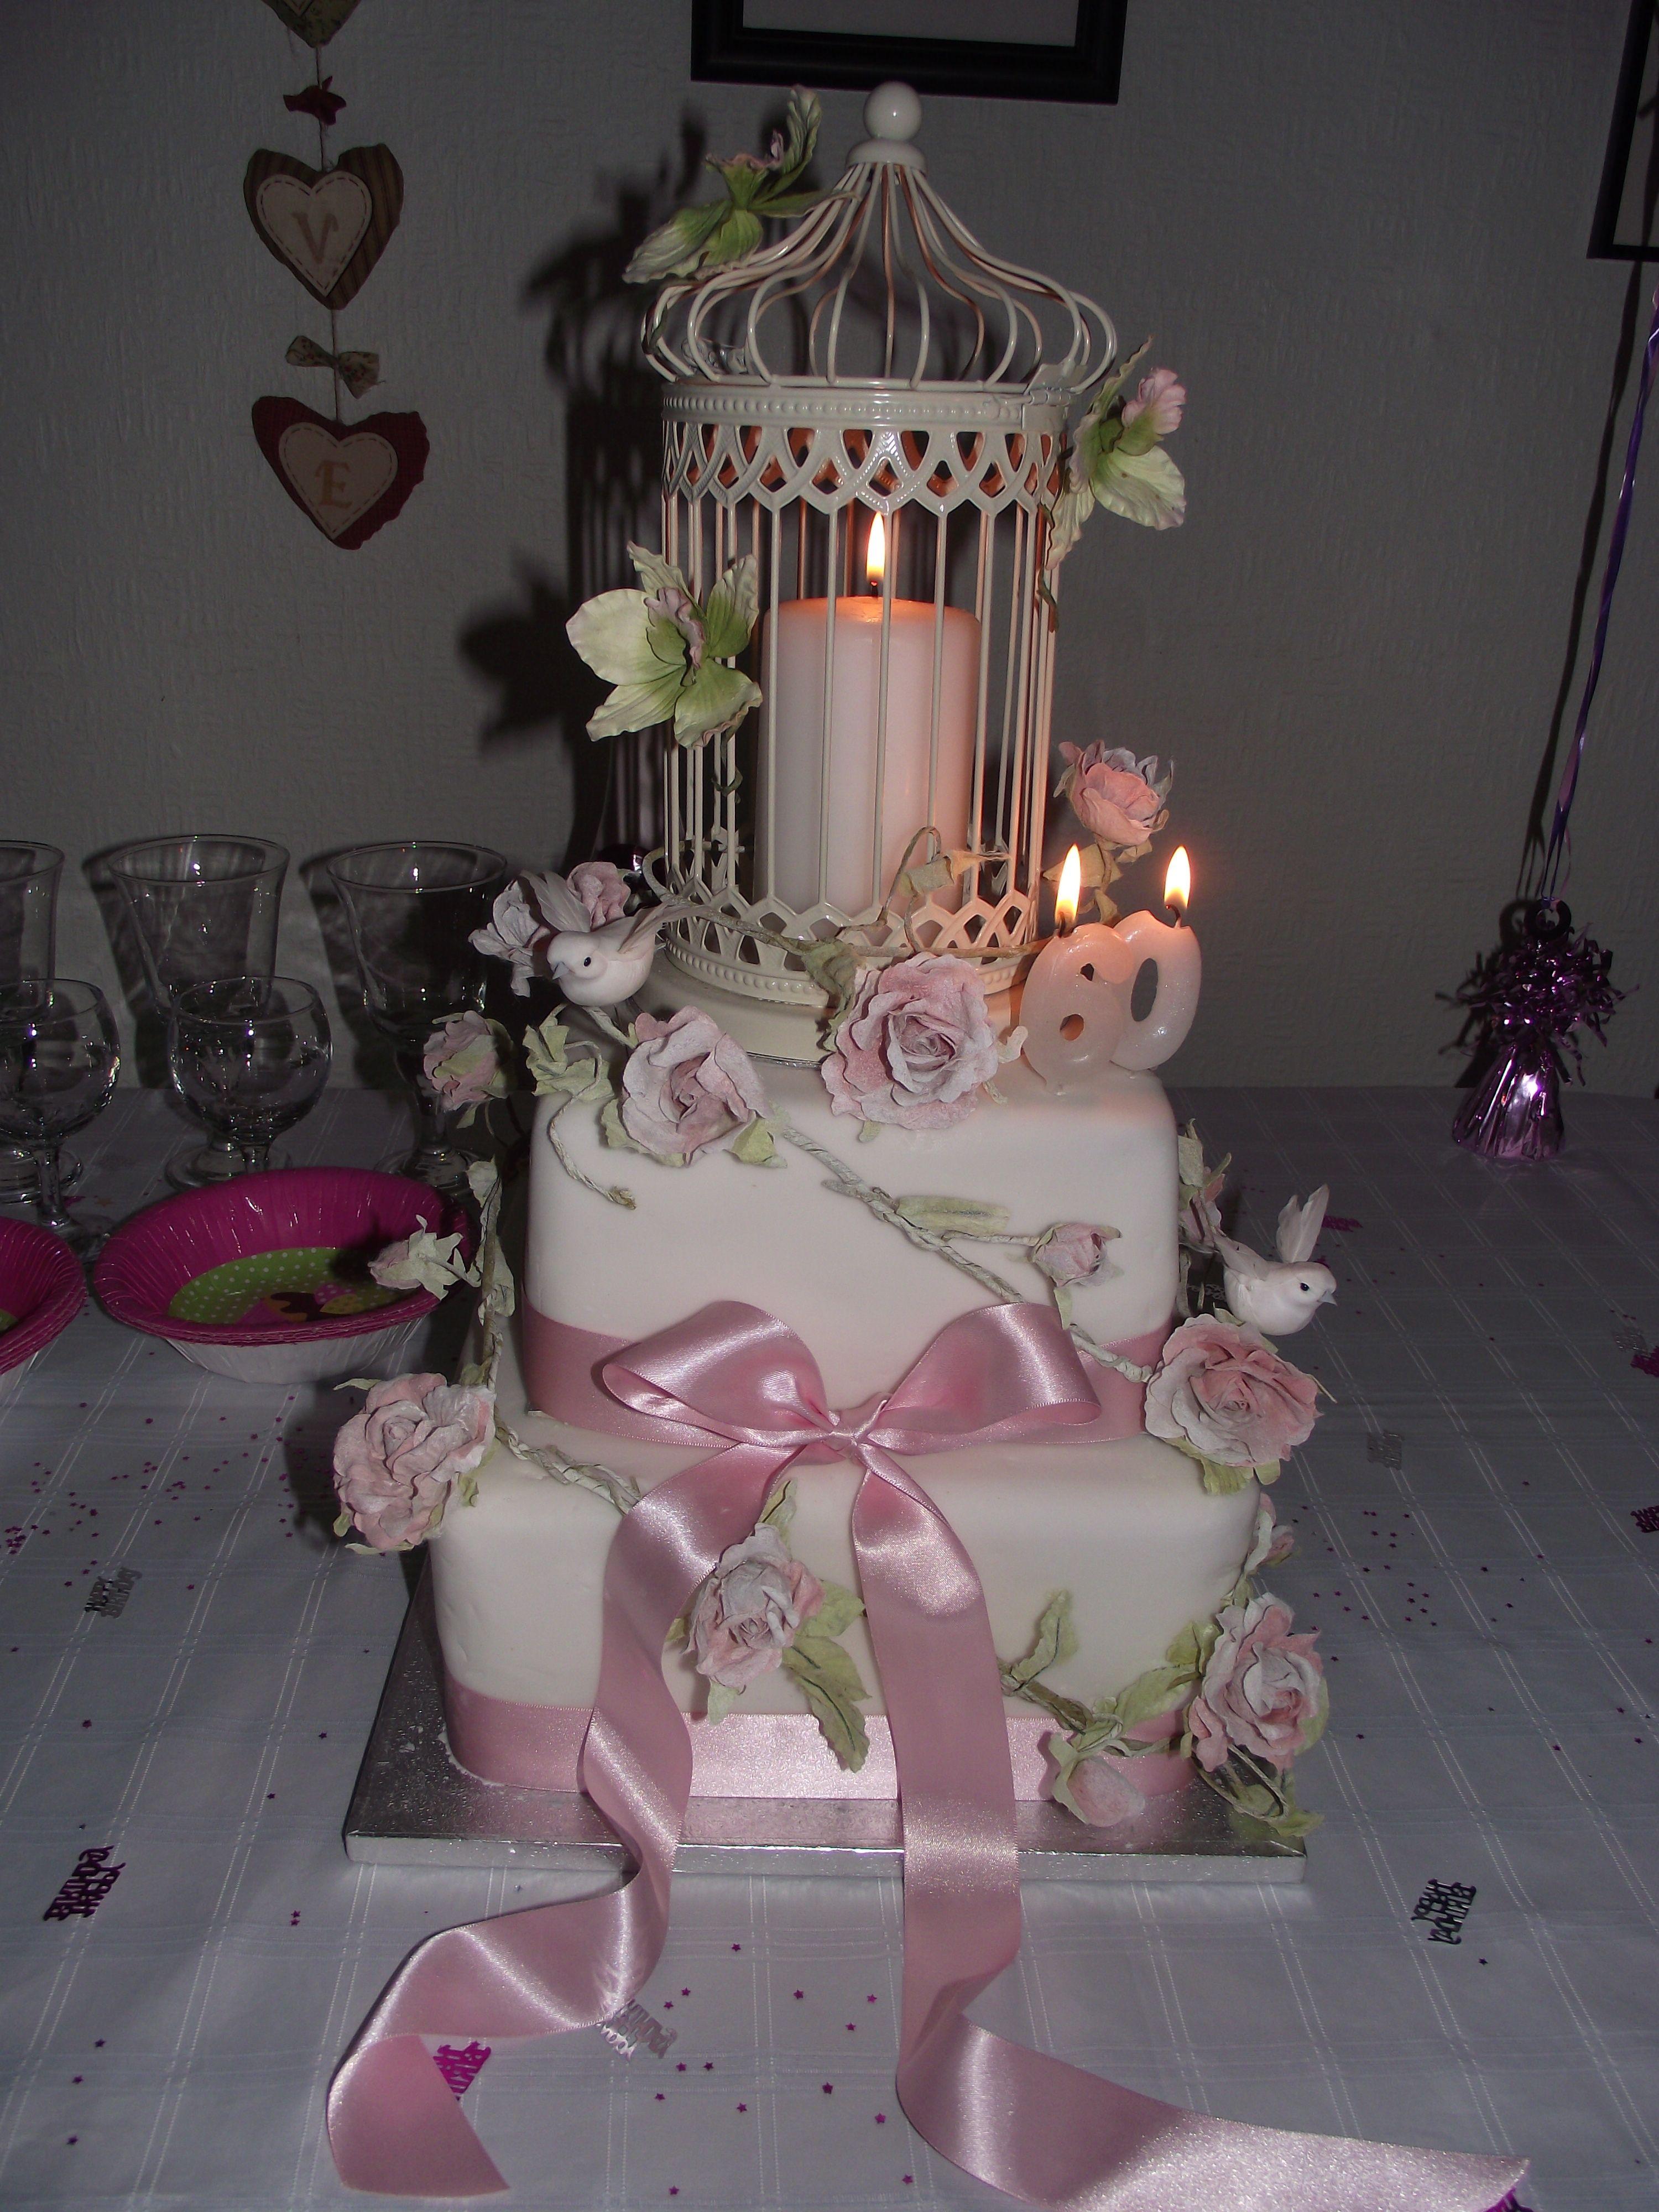 23+ Amazing cake decorating supplies ideas